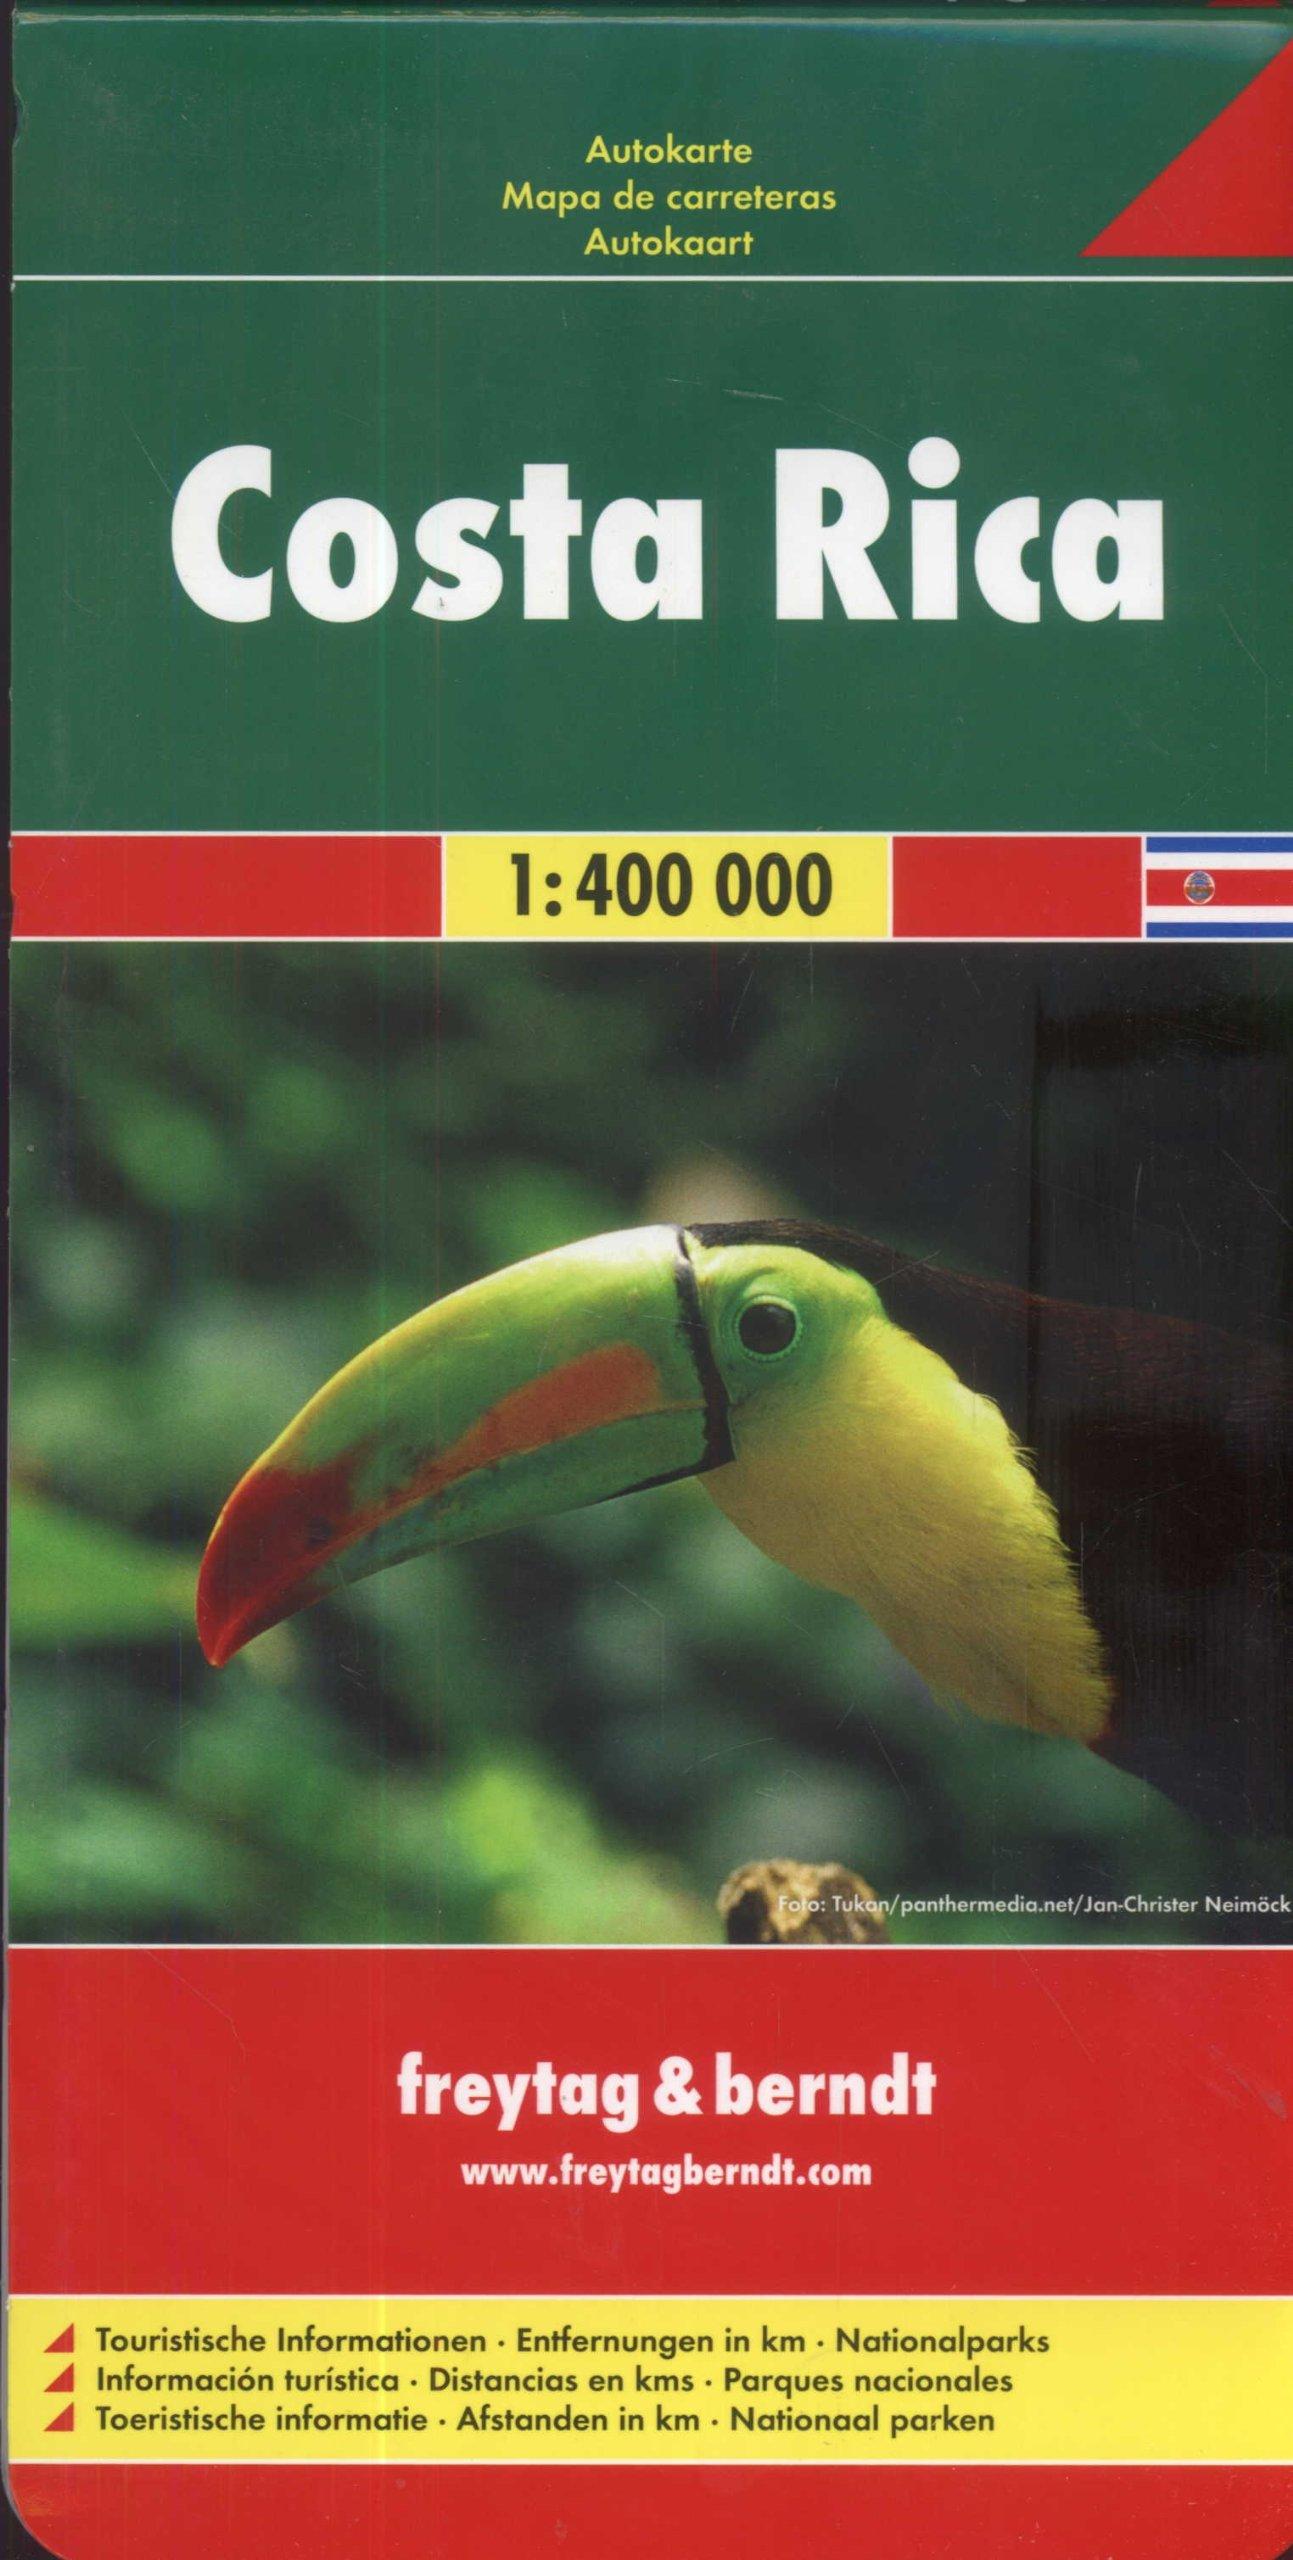 Freytag Berndt Autokarten, Costa Rica - Maßstab 1:400 000